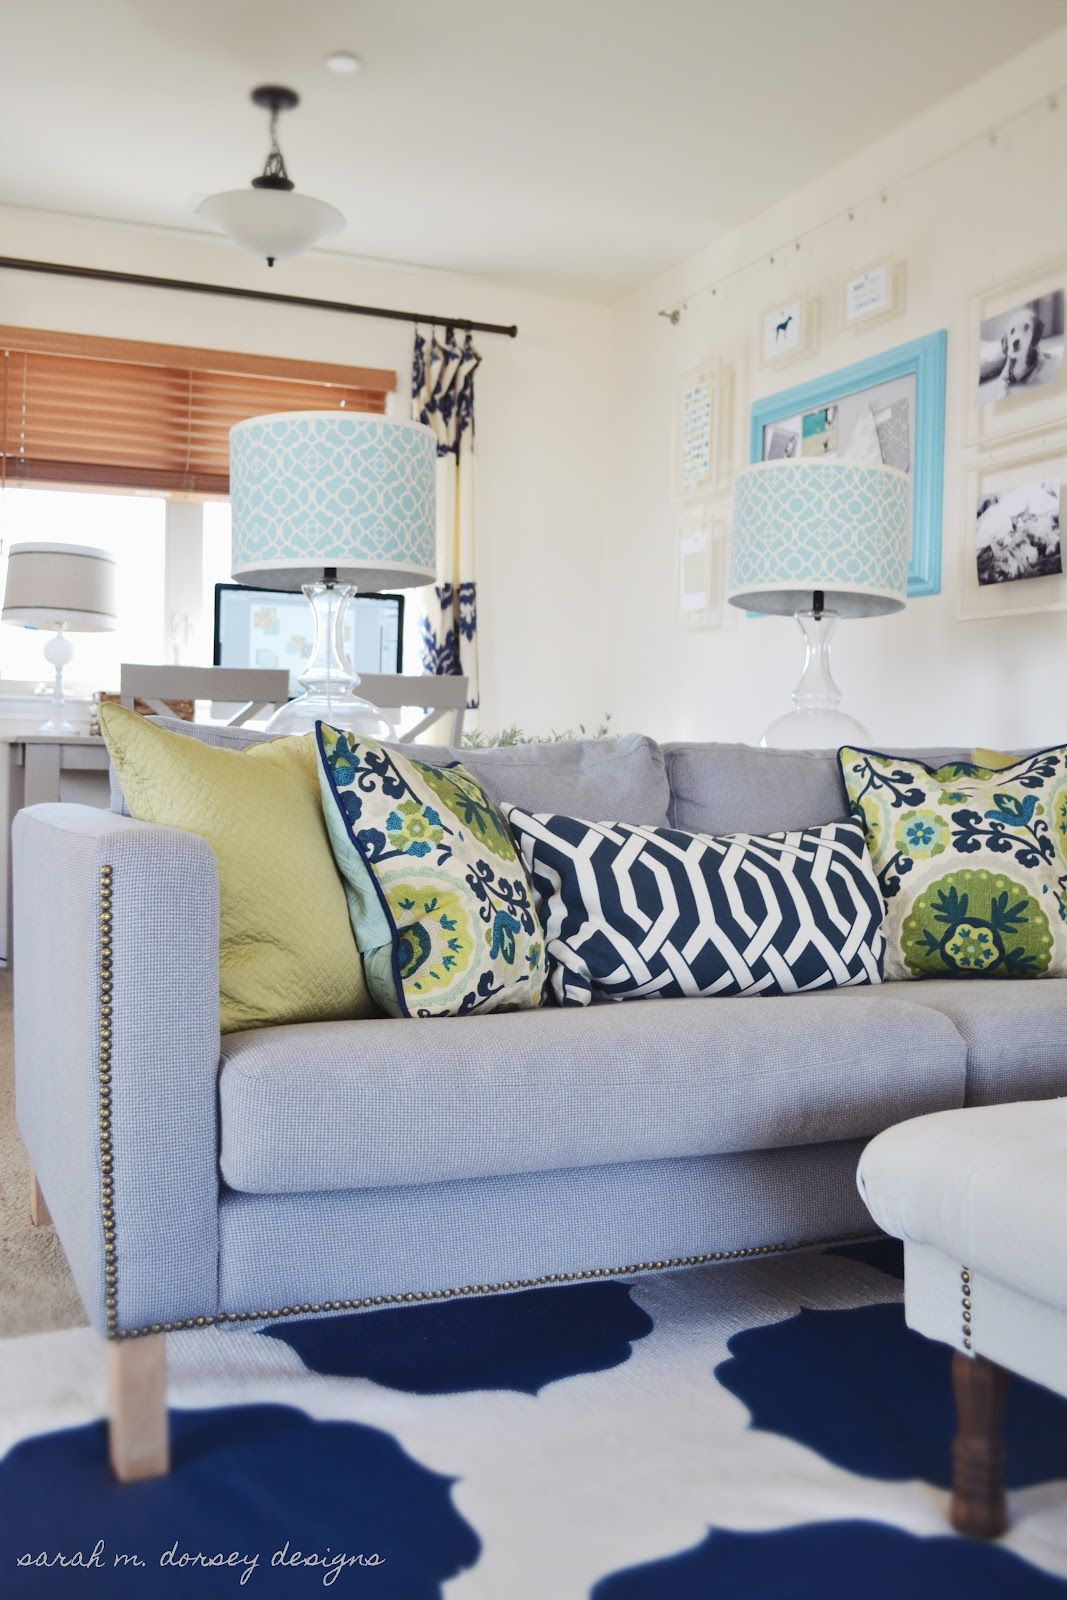 Sarah M Dorsey Designs Karlstad Sofa With Nailhead Trim Home Rh Pinterest  Com